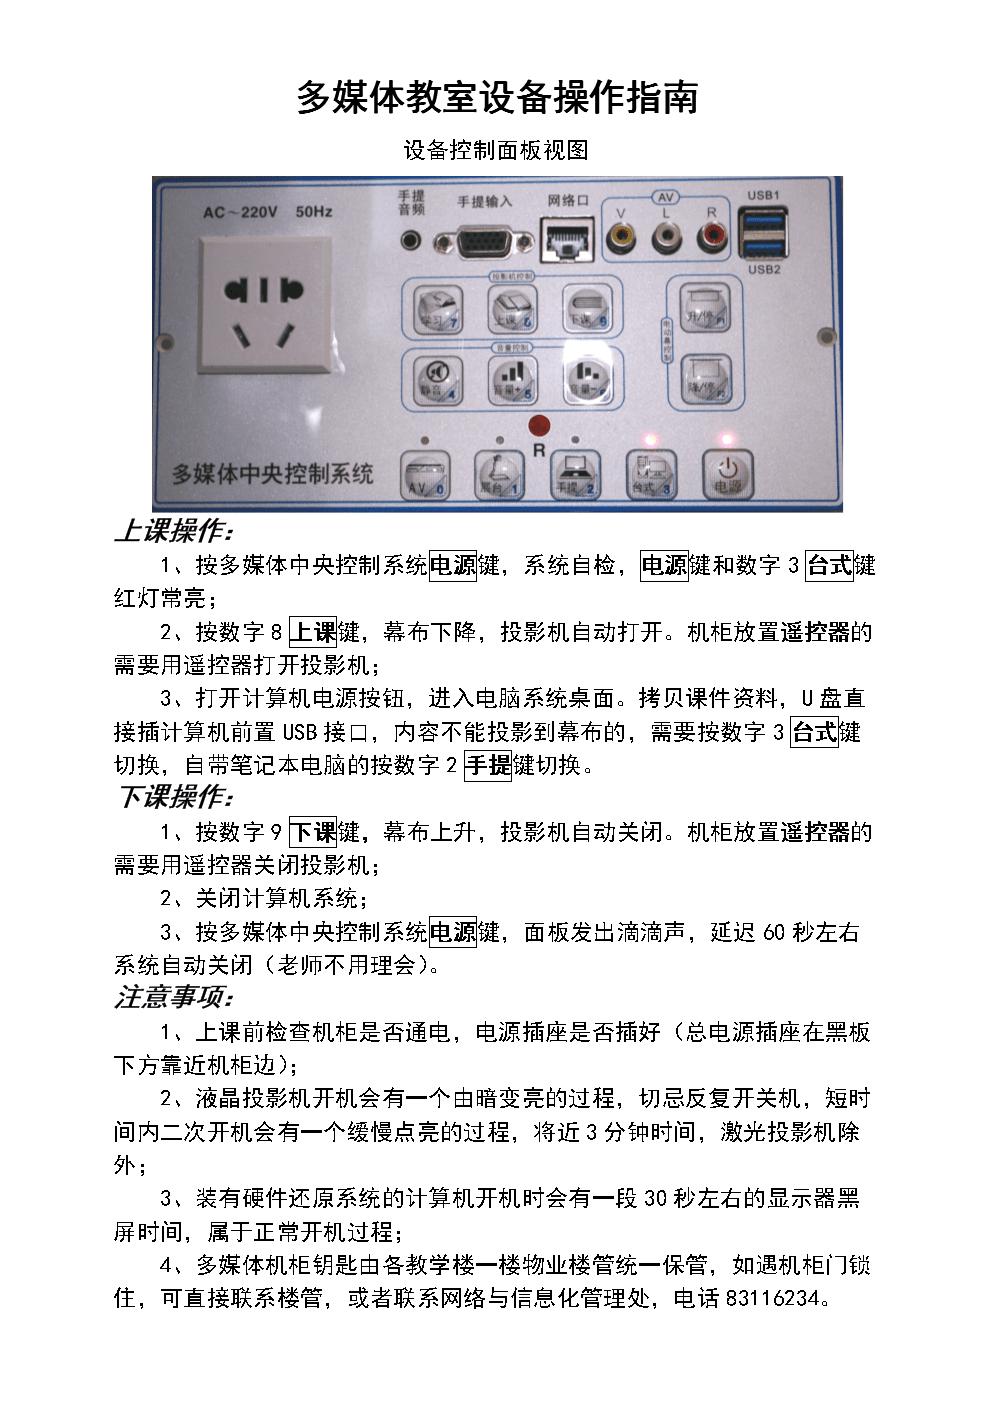 HS-350A多媒体教室设备操作指南.docx